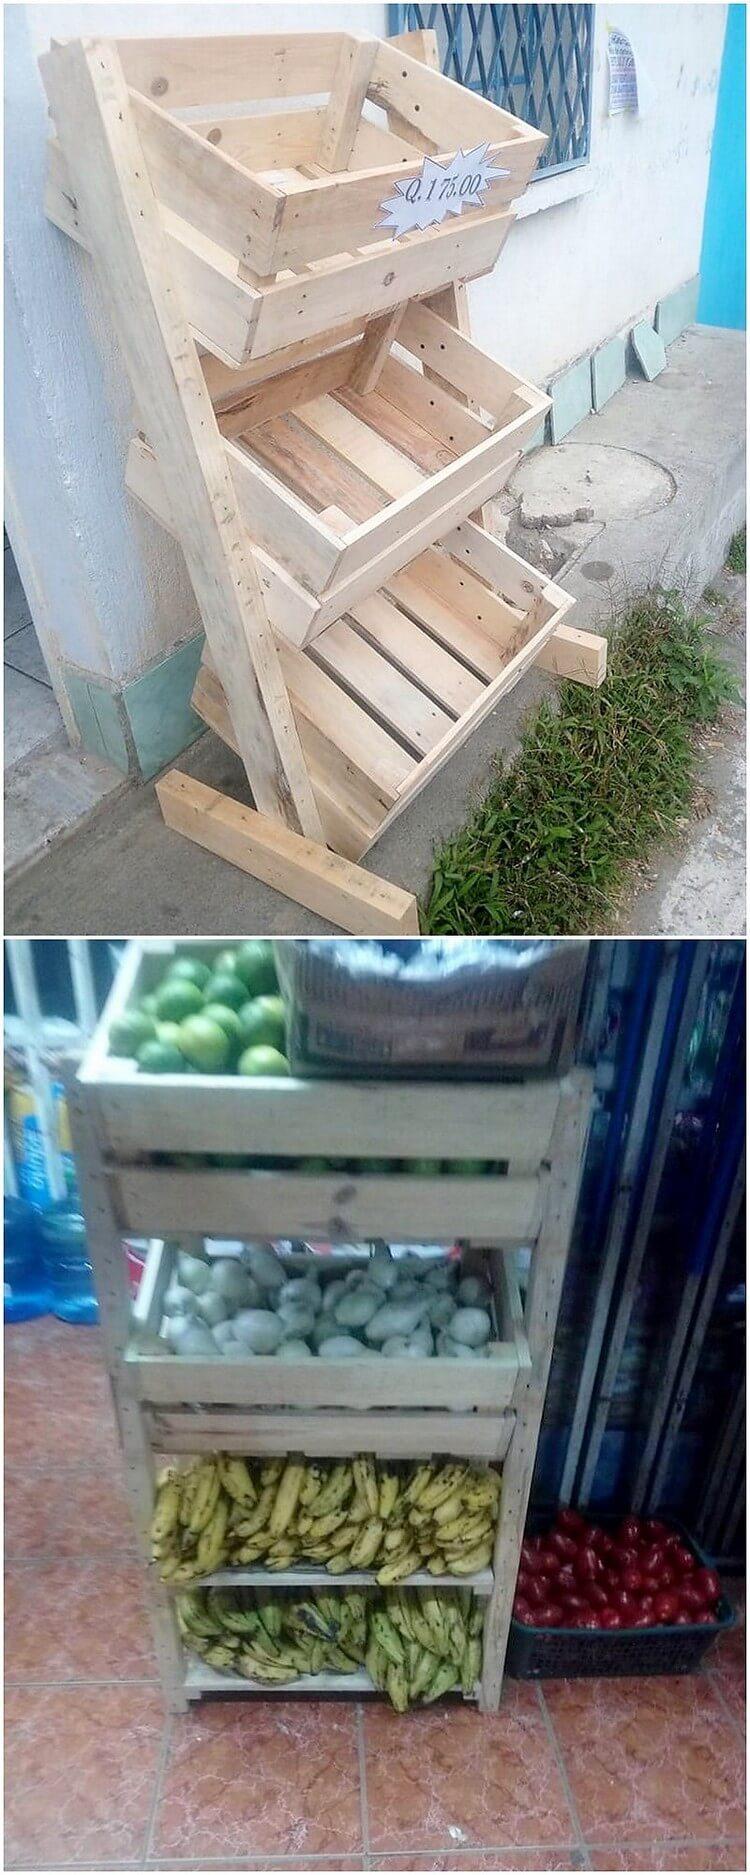 Wood Pallet Vegetables and Fruits Rack